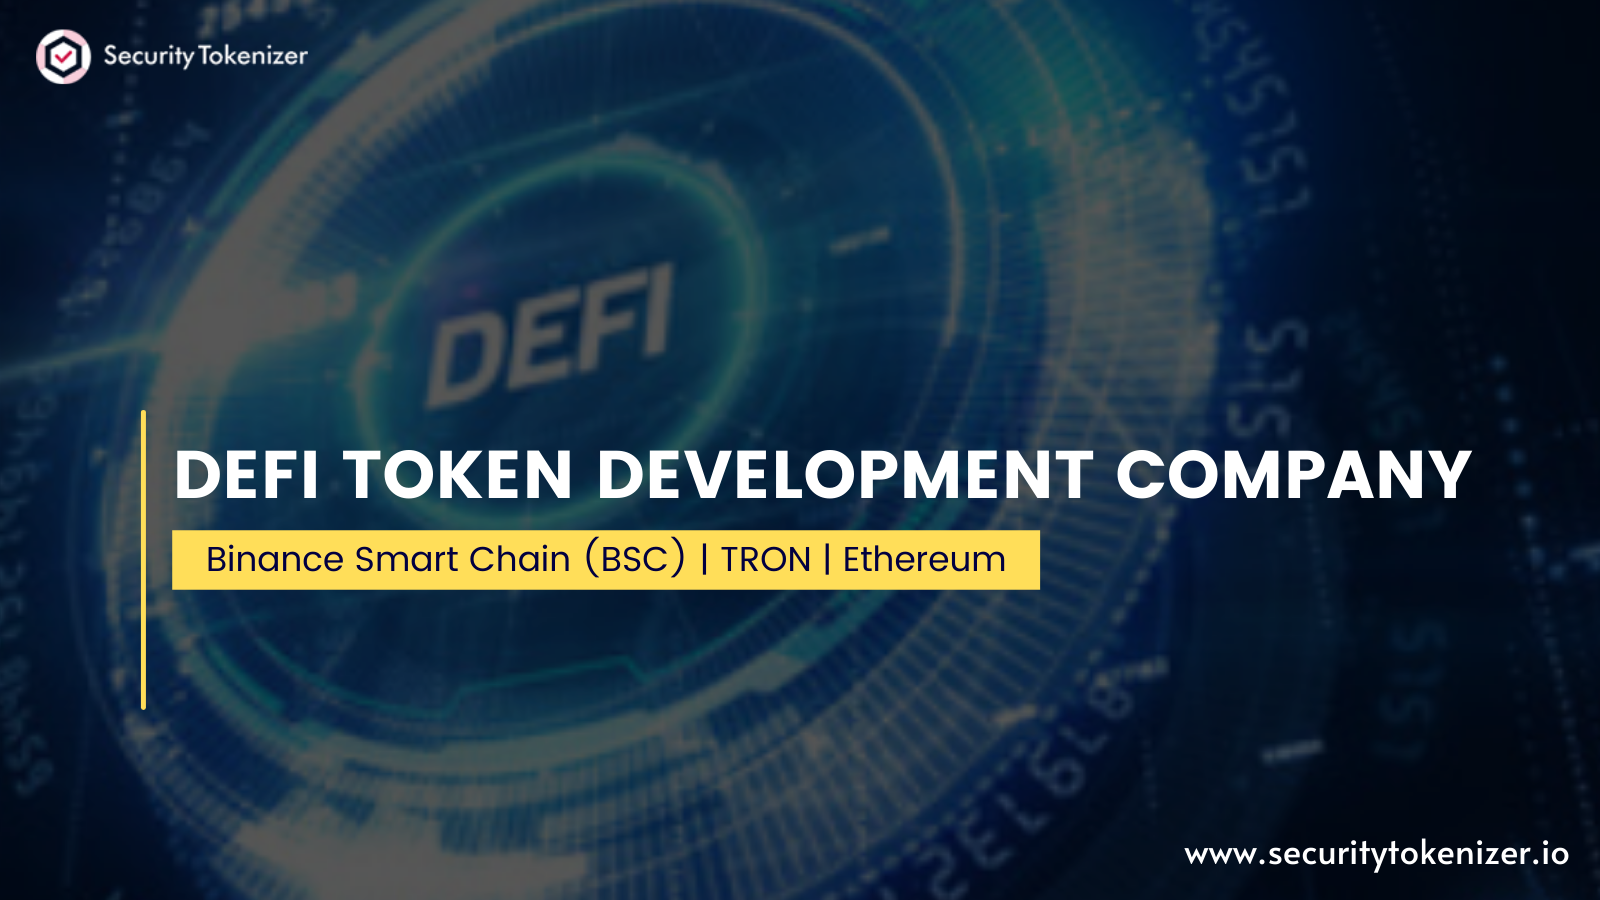 DeFi Token Development Company